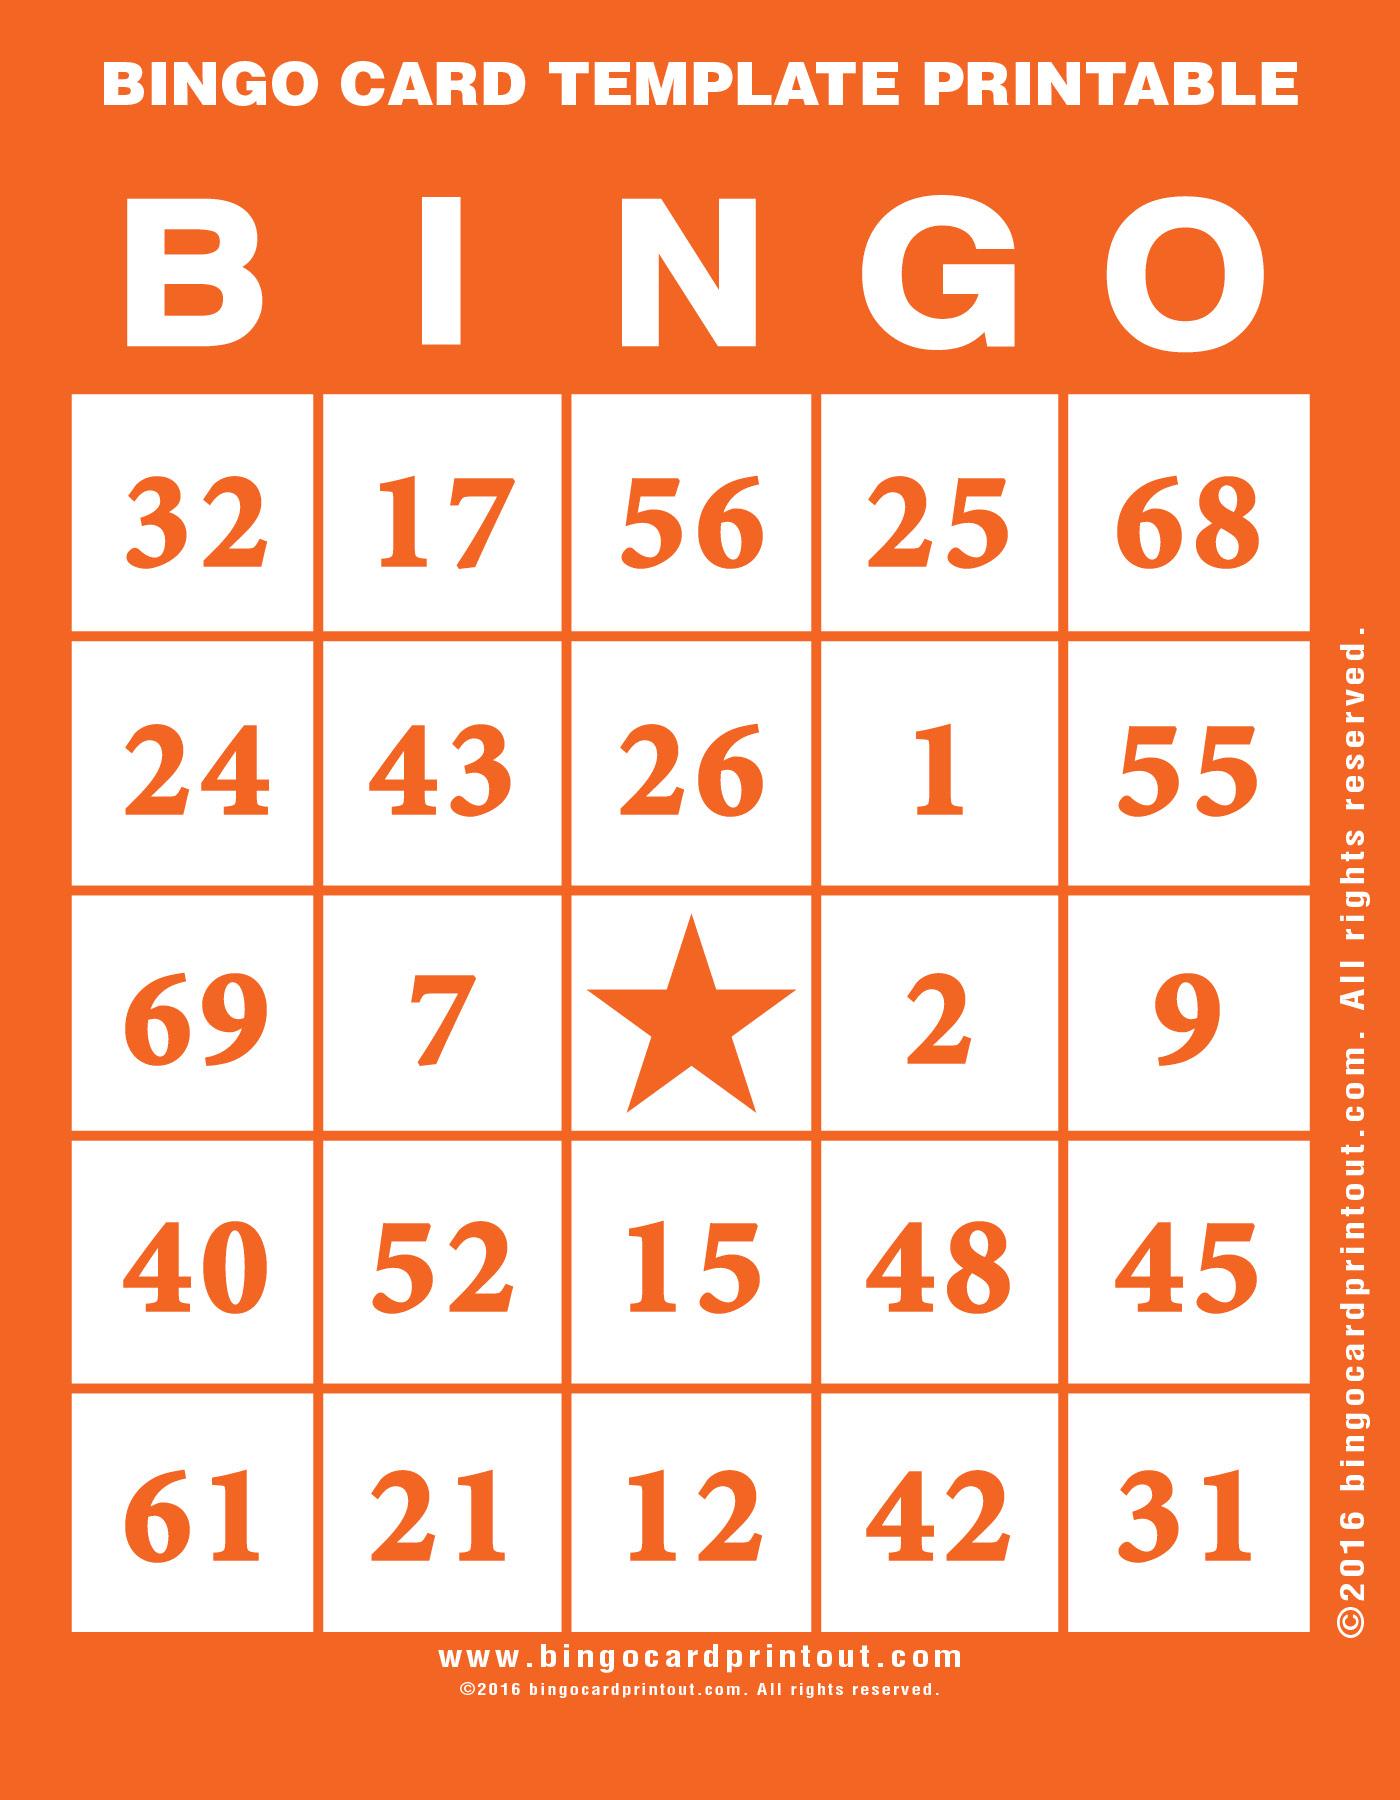 Bingo Card Template Printable - BingoCardPrintout.com